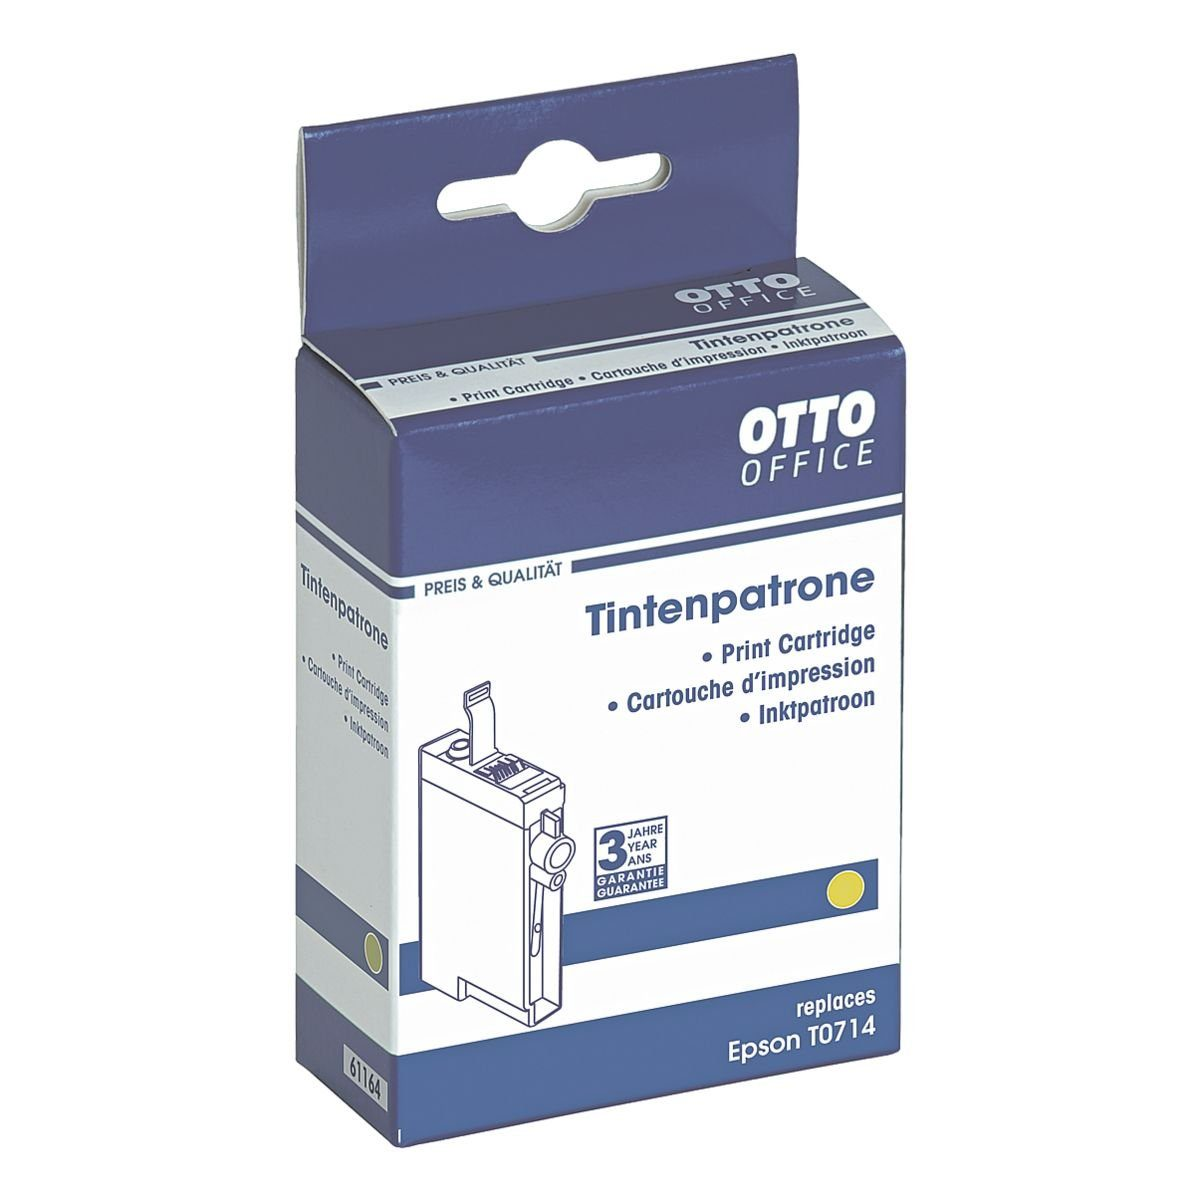 OTTO Office Tintenpatrone ersetzt Epson »T0714«